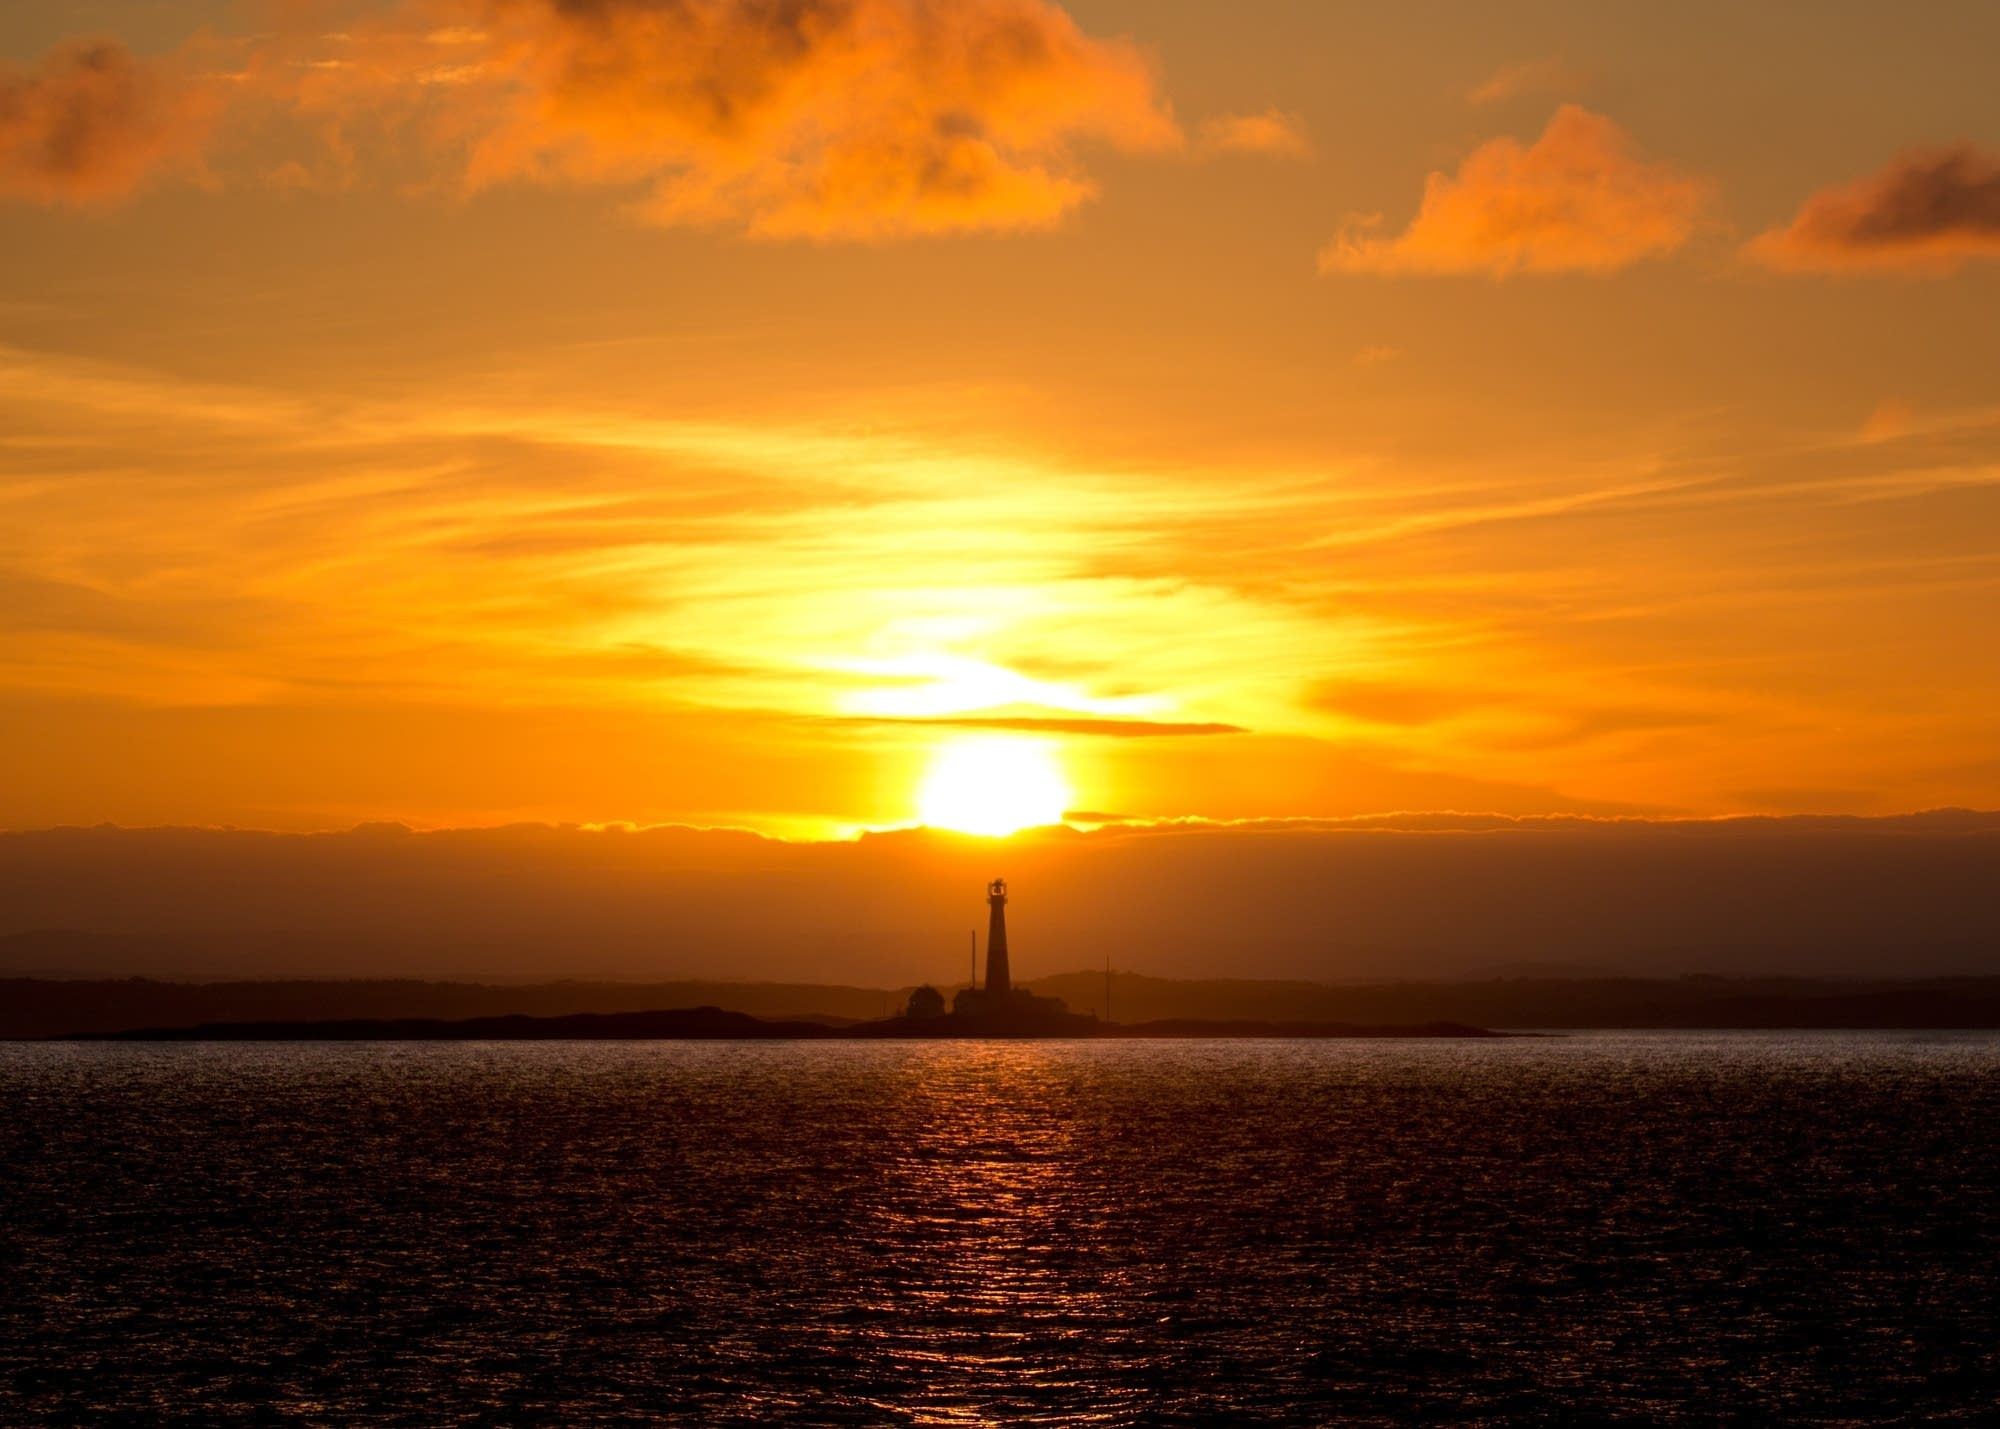 Oslo - 25 - sunset over lighthouse